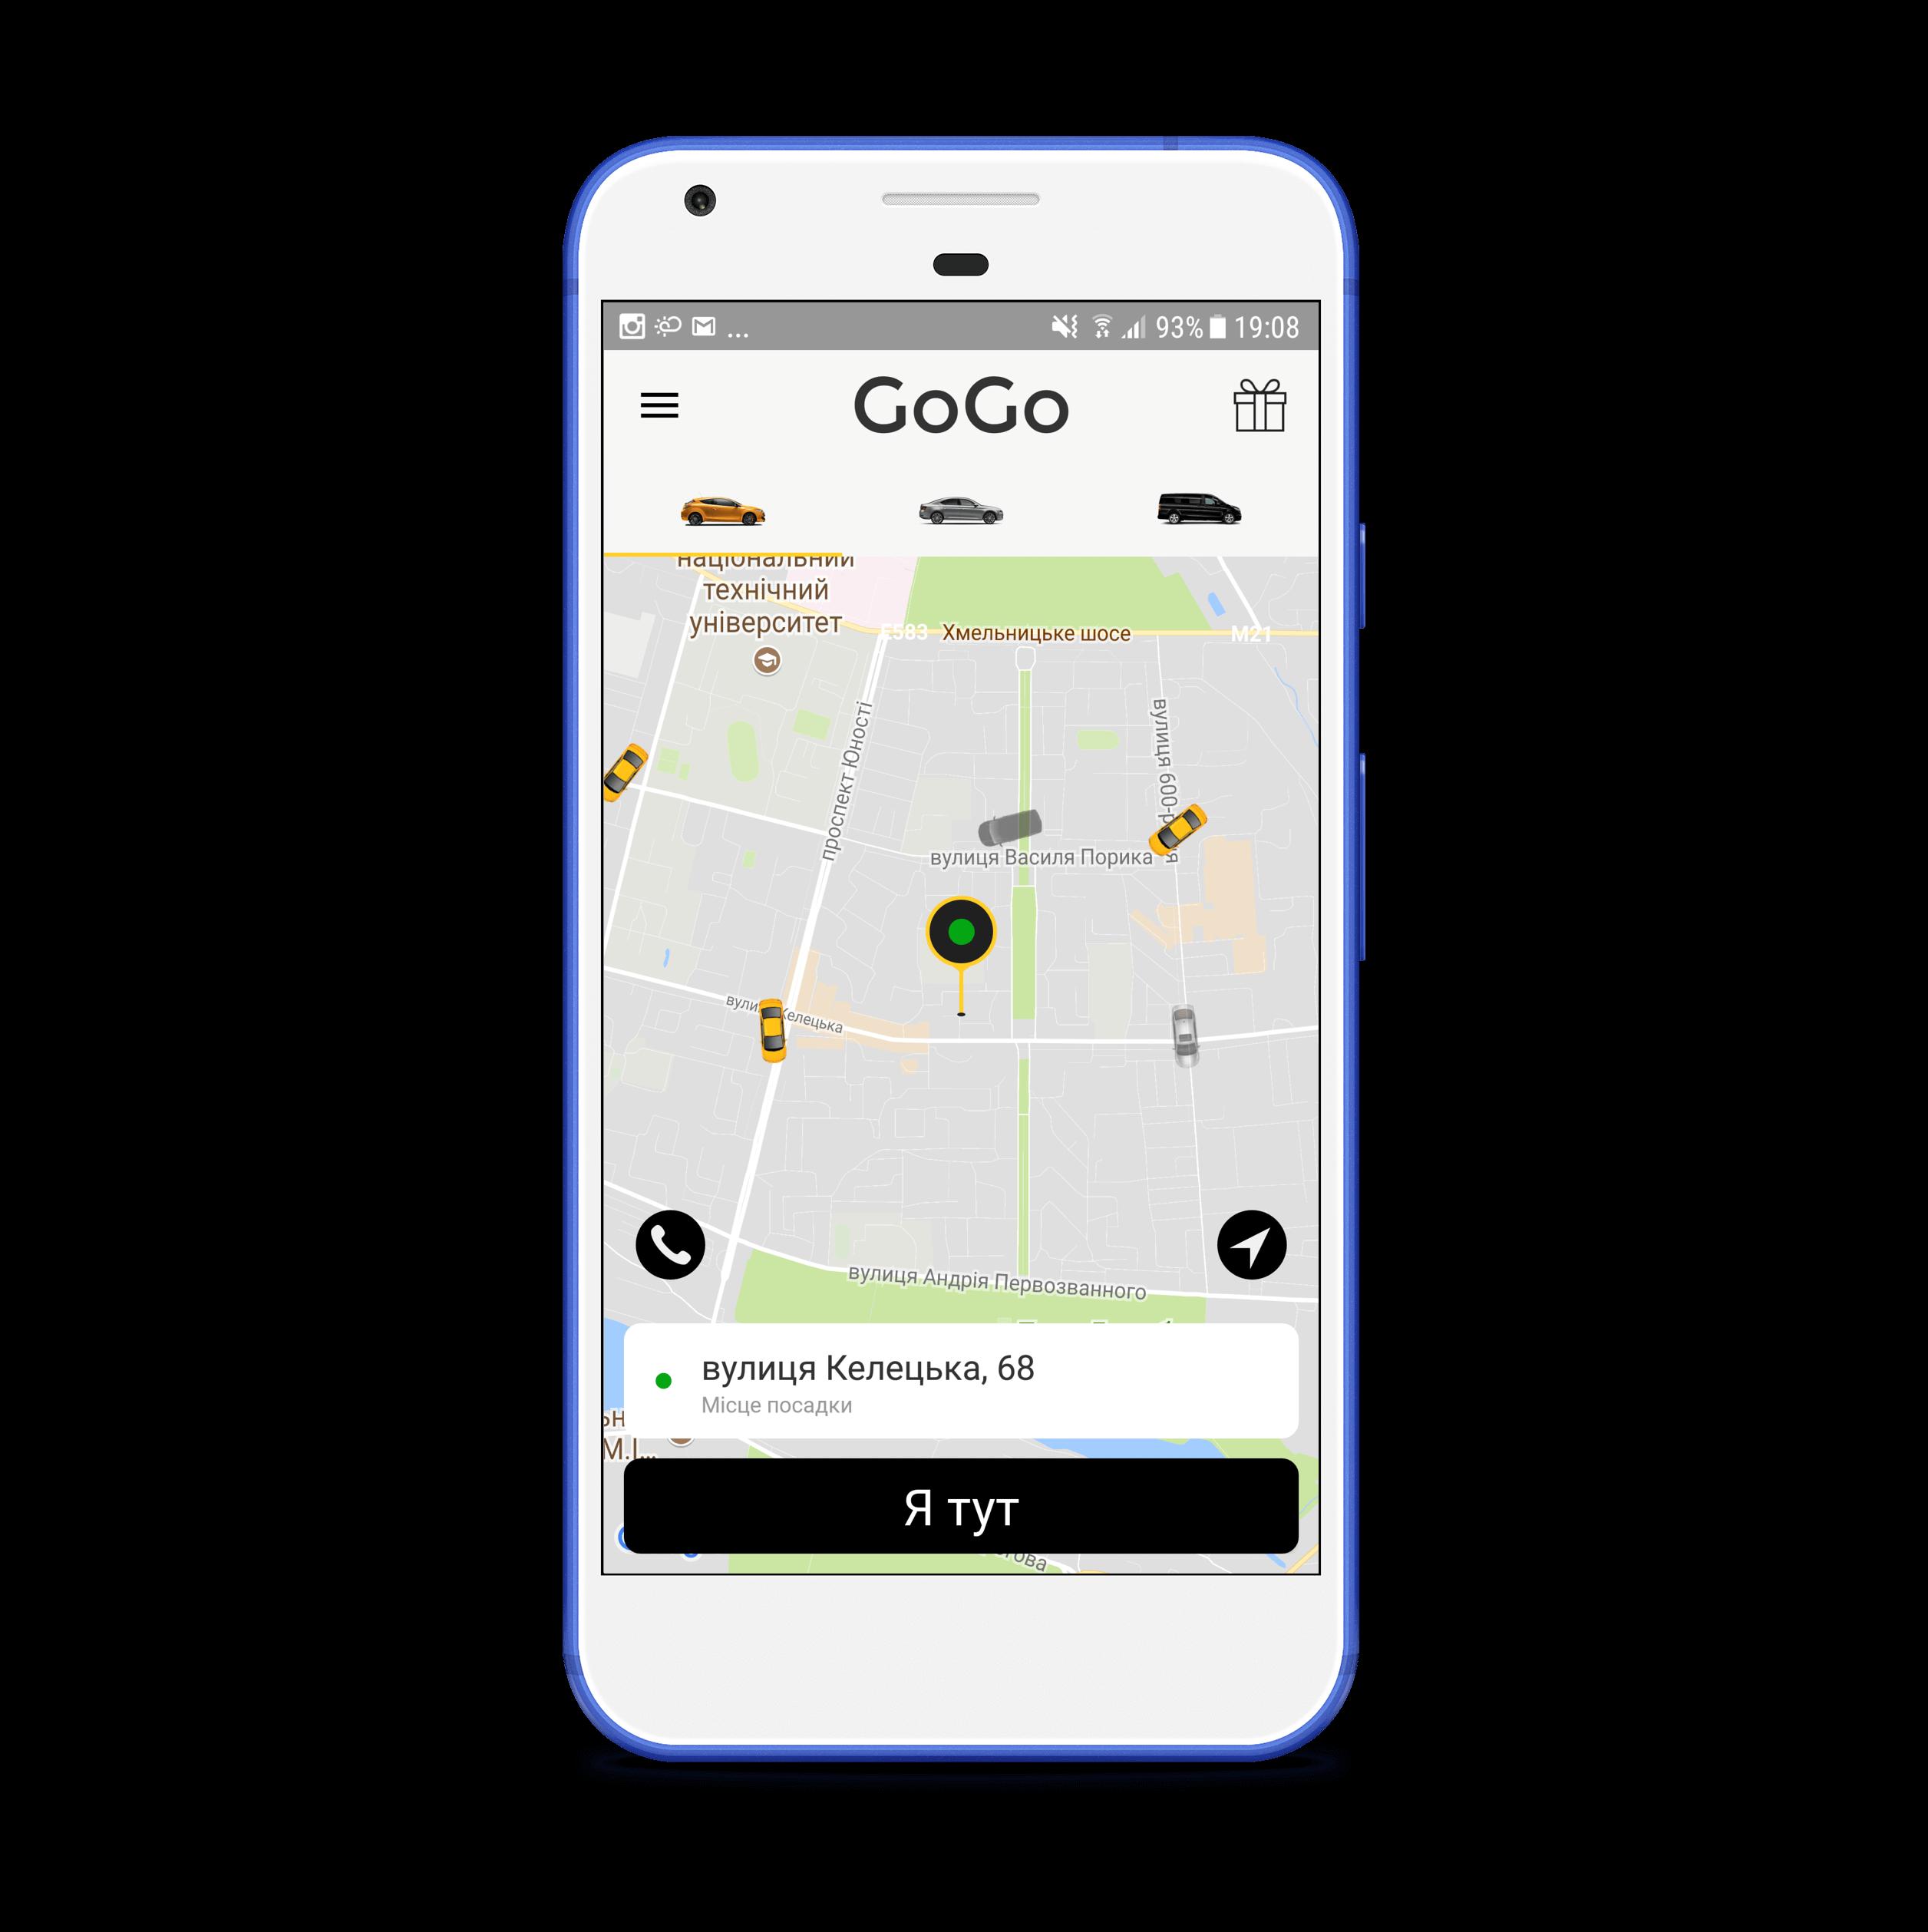 GoGo - Google Play